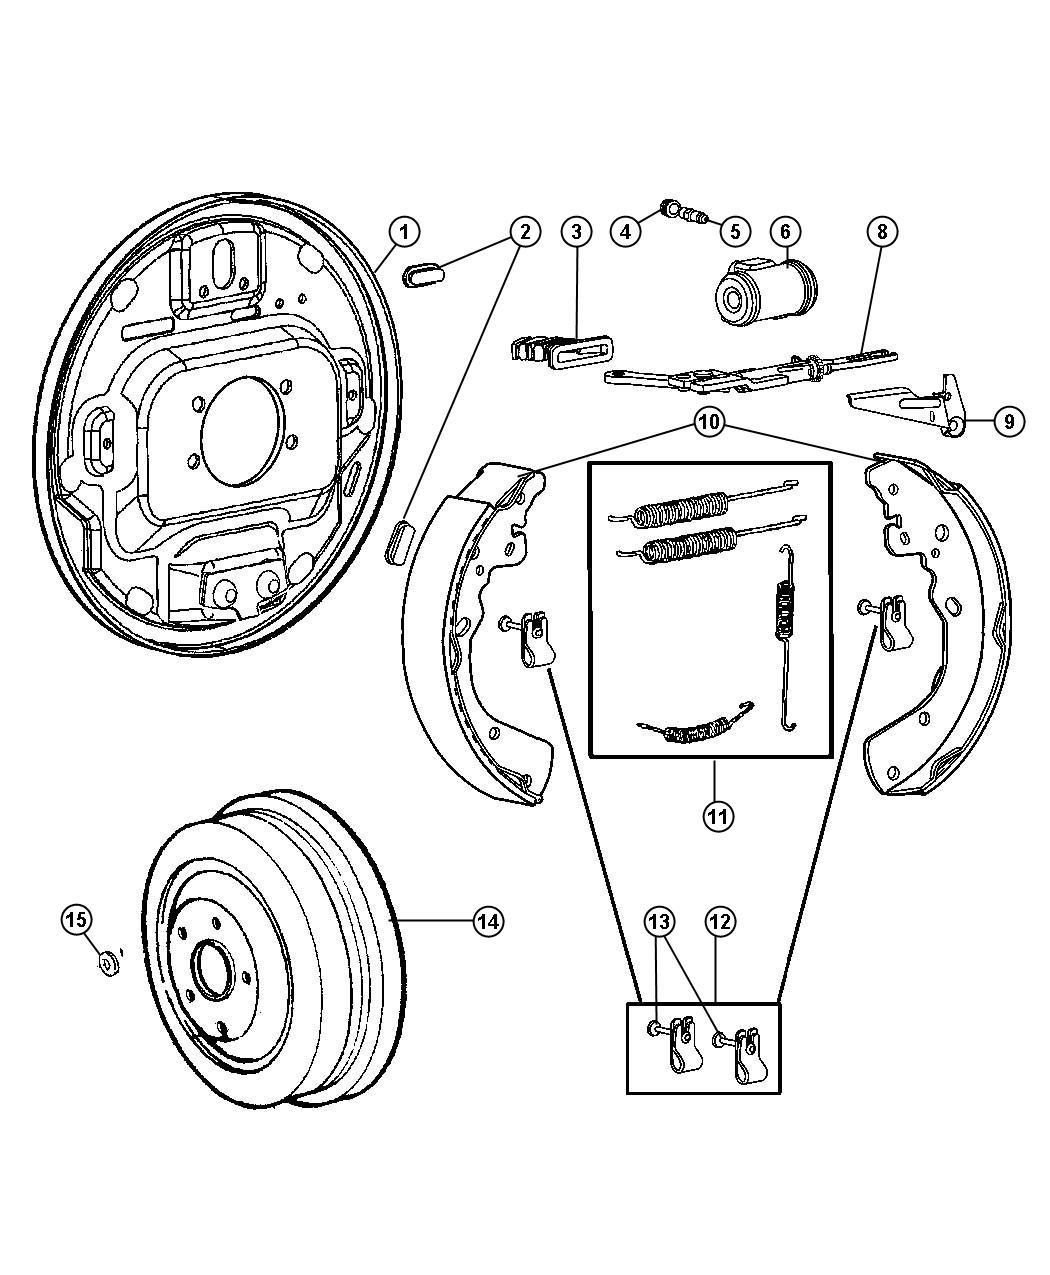 1991 dodge ram 250 wiring diagram